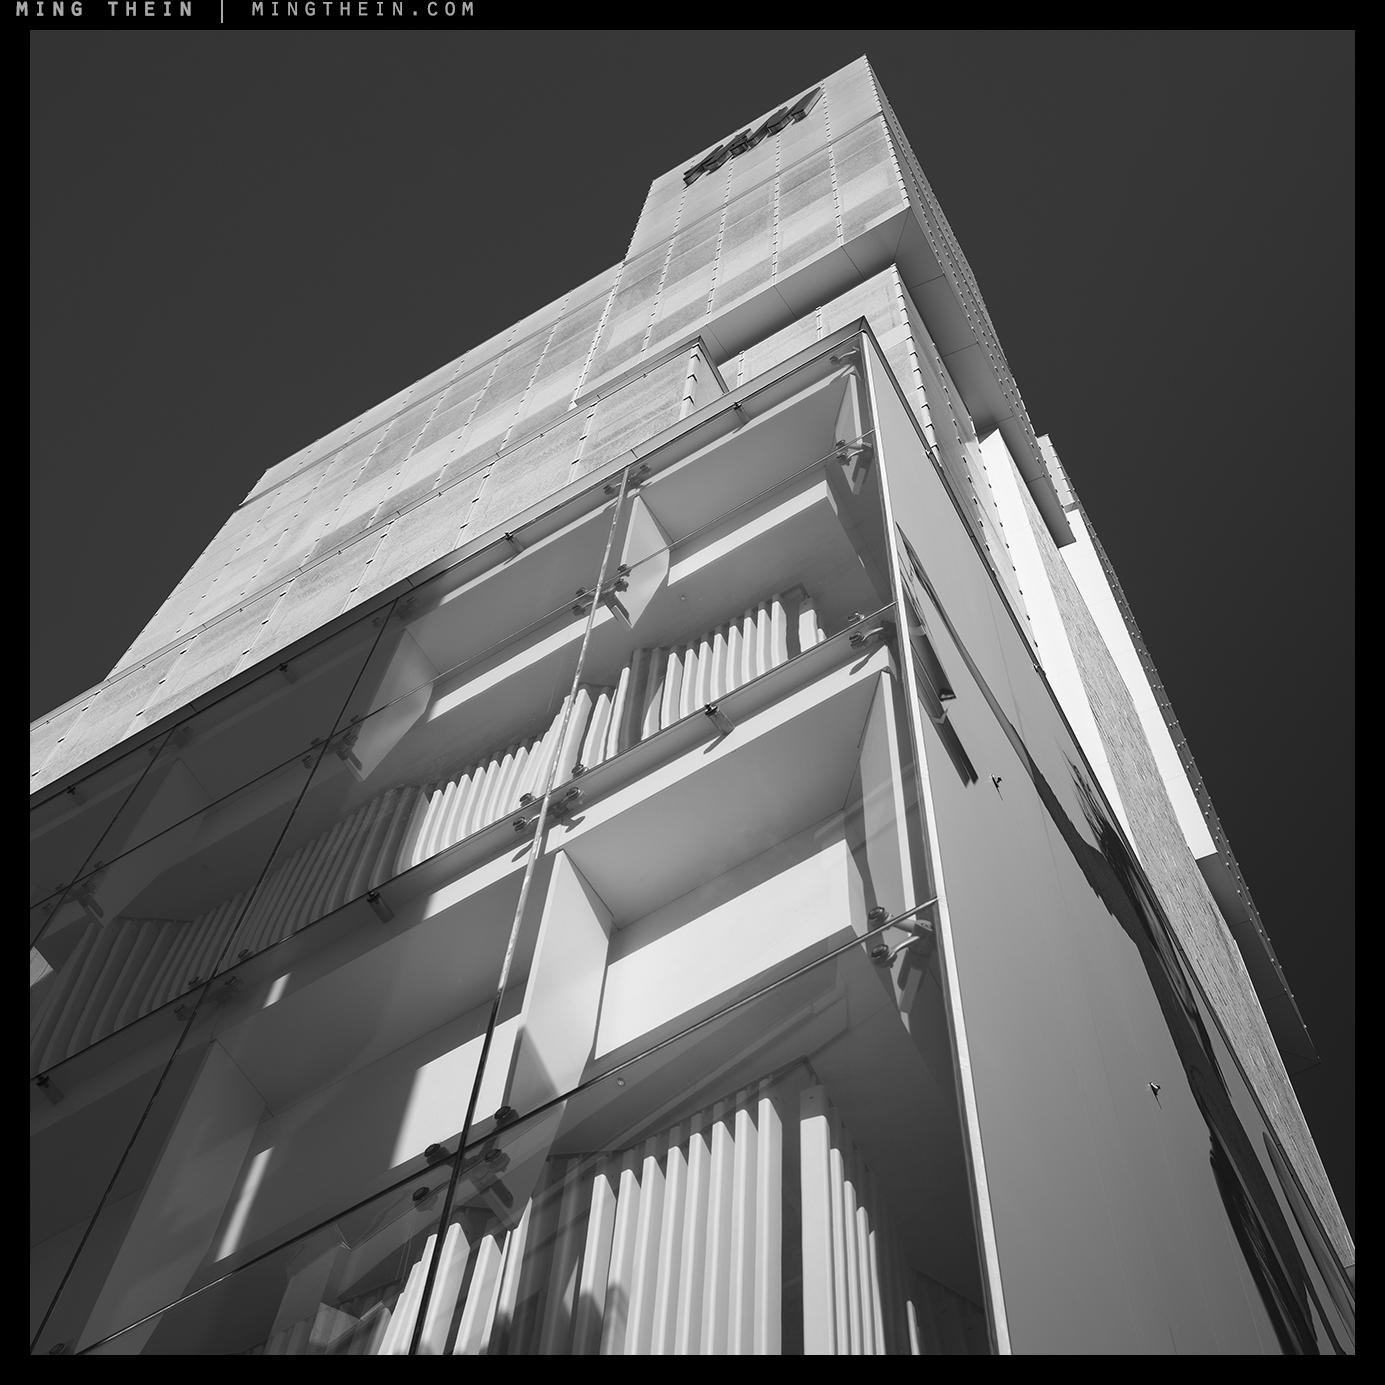 54_7502740 verticality LIV copy.jpg